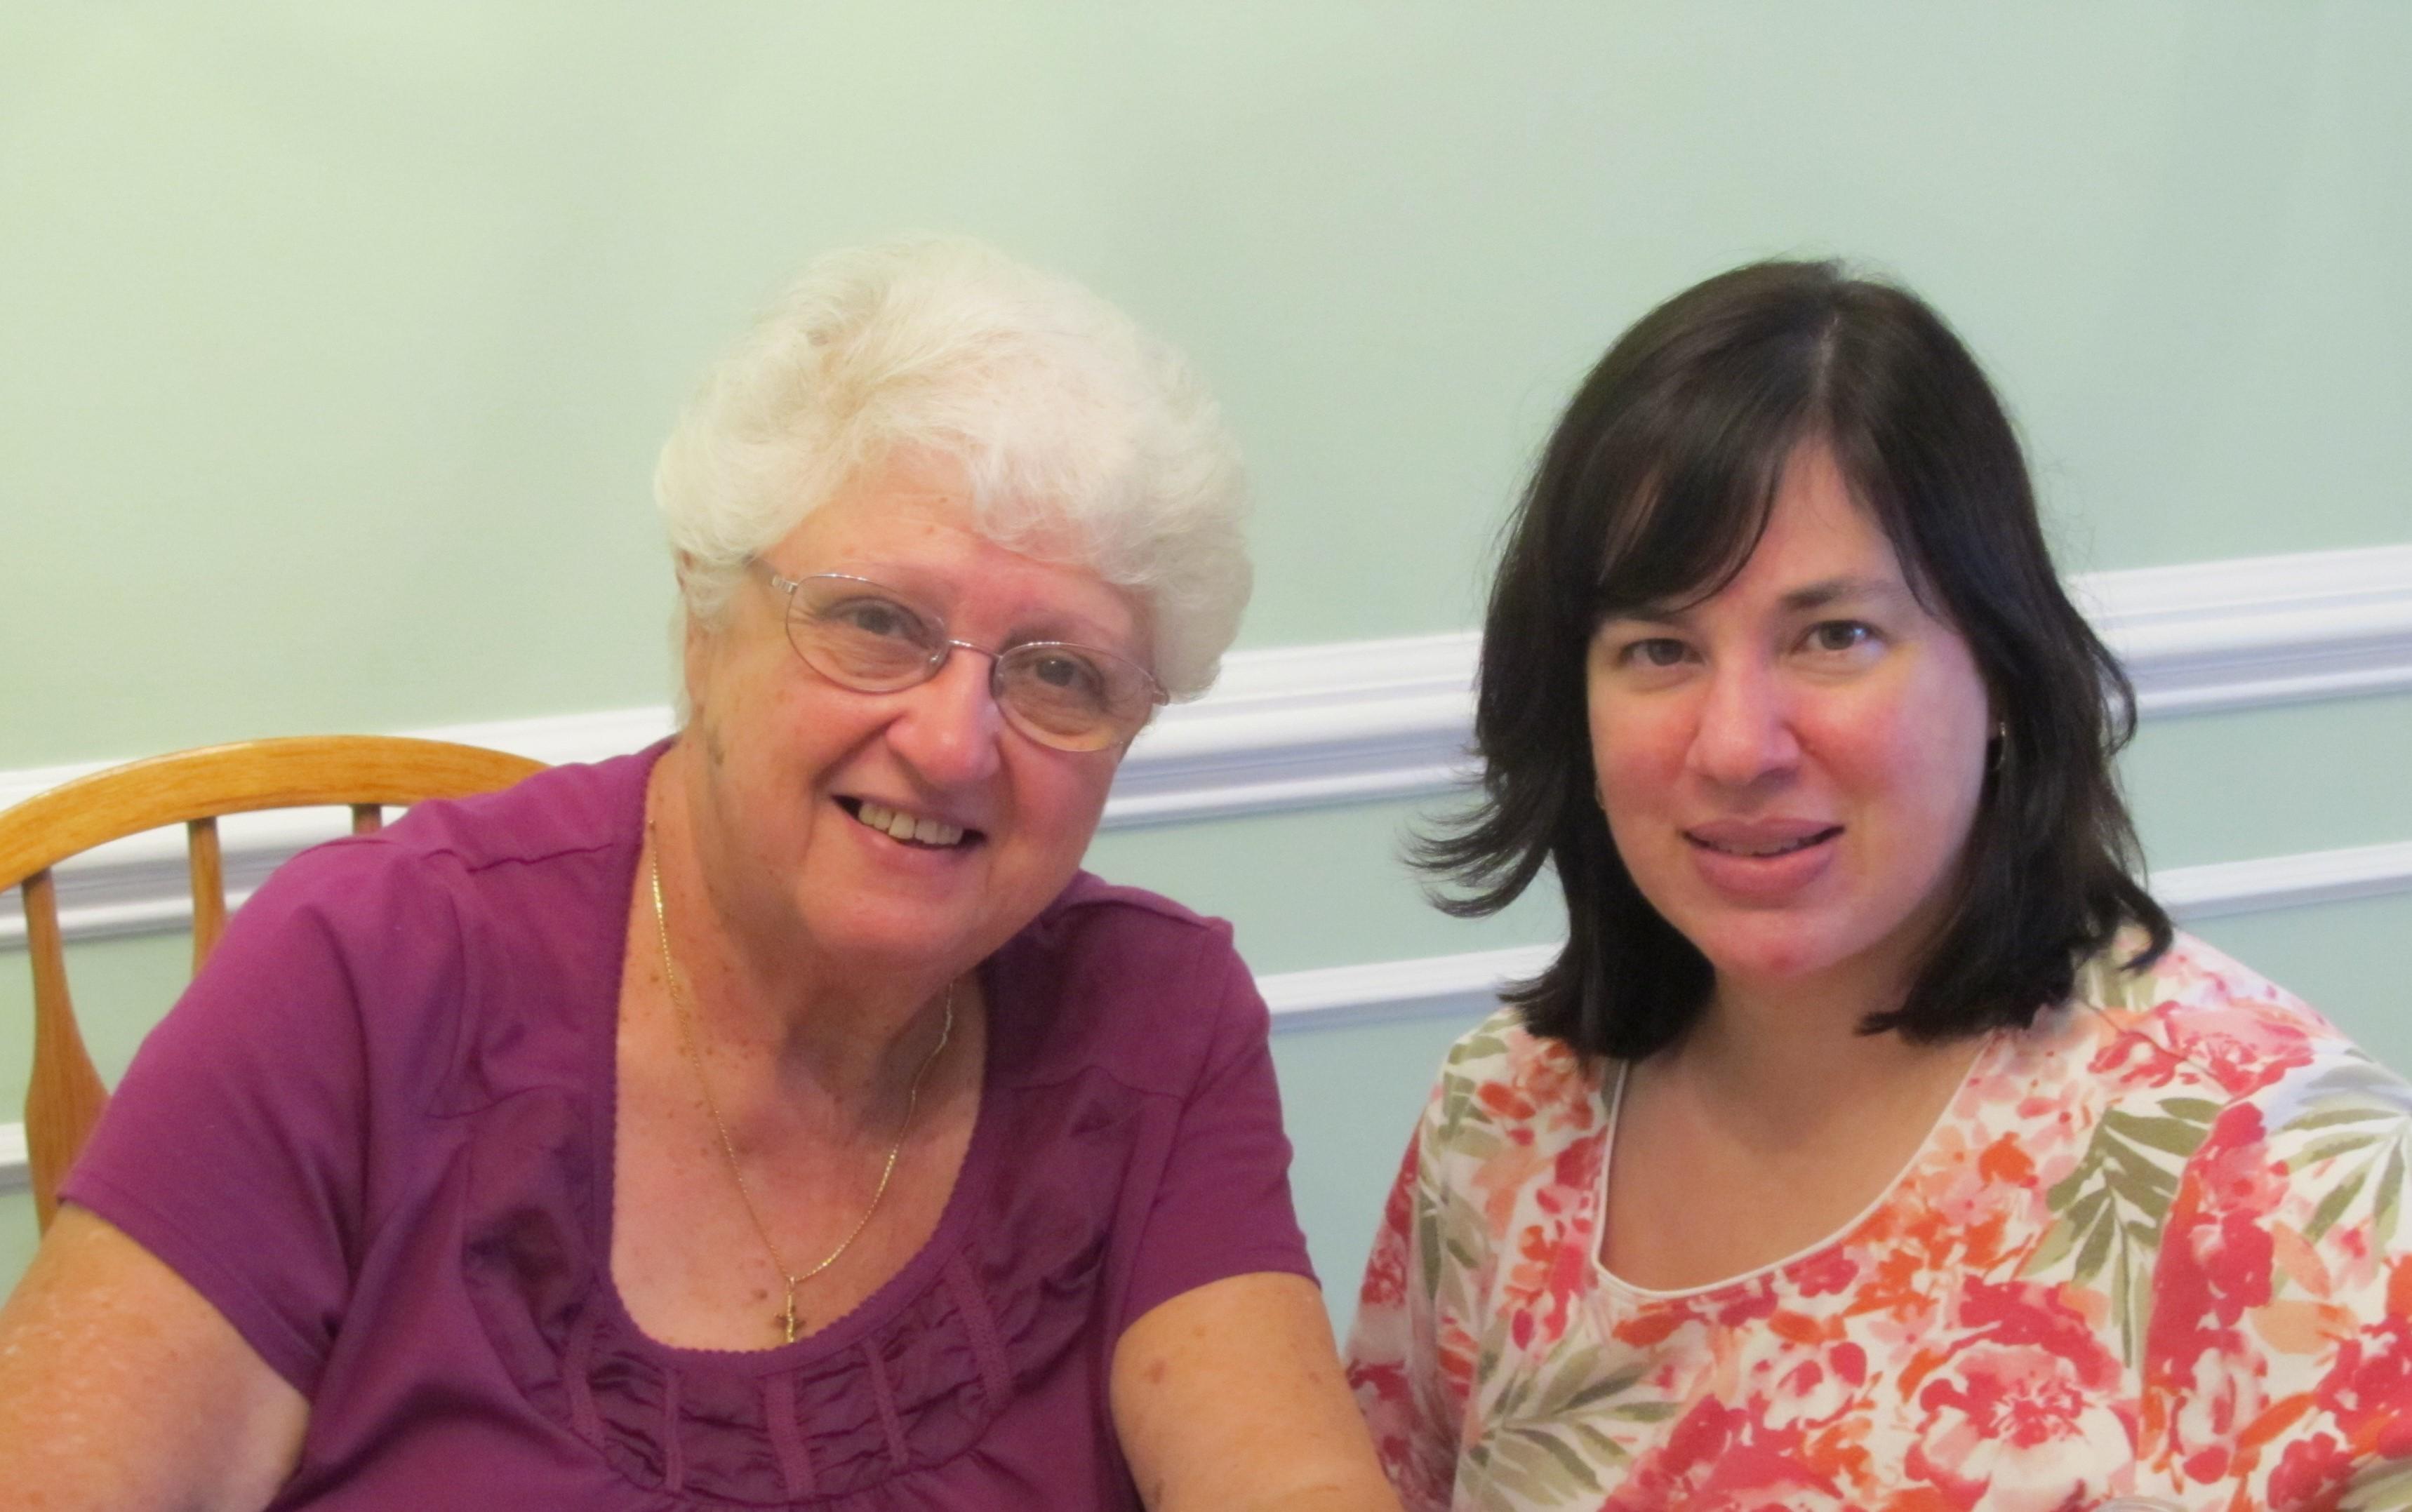 2_Aunt, Zia, Maria Moore and niece, Lori Pastro, visiting_IMG_0411 (2).JPG